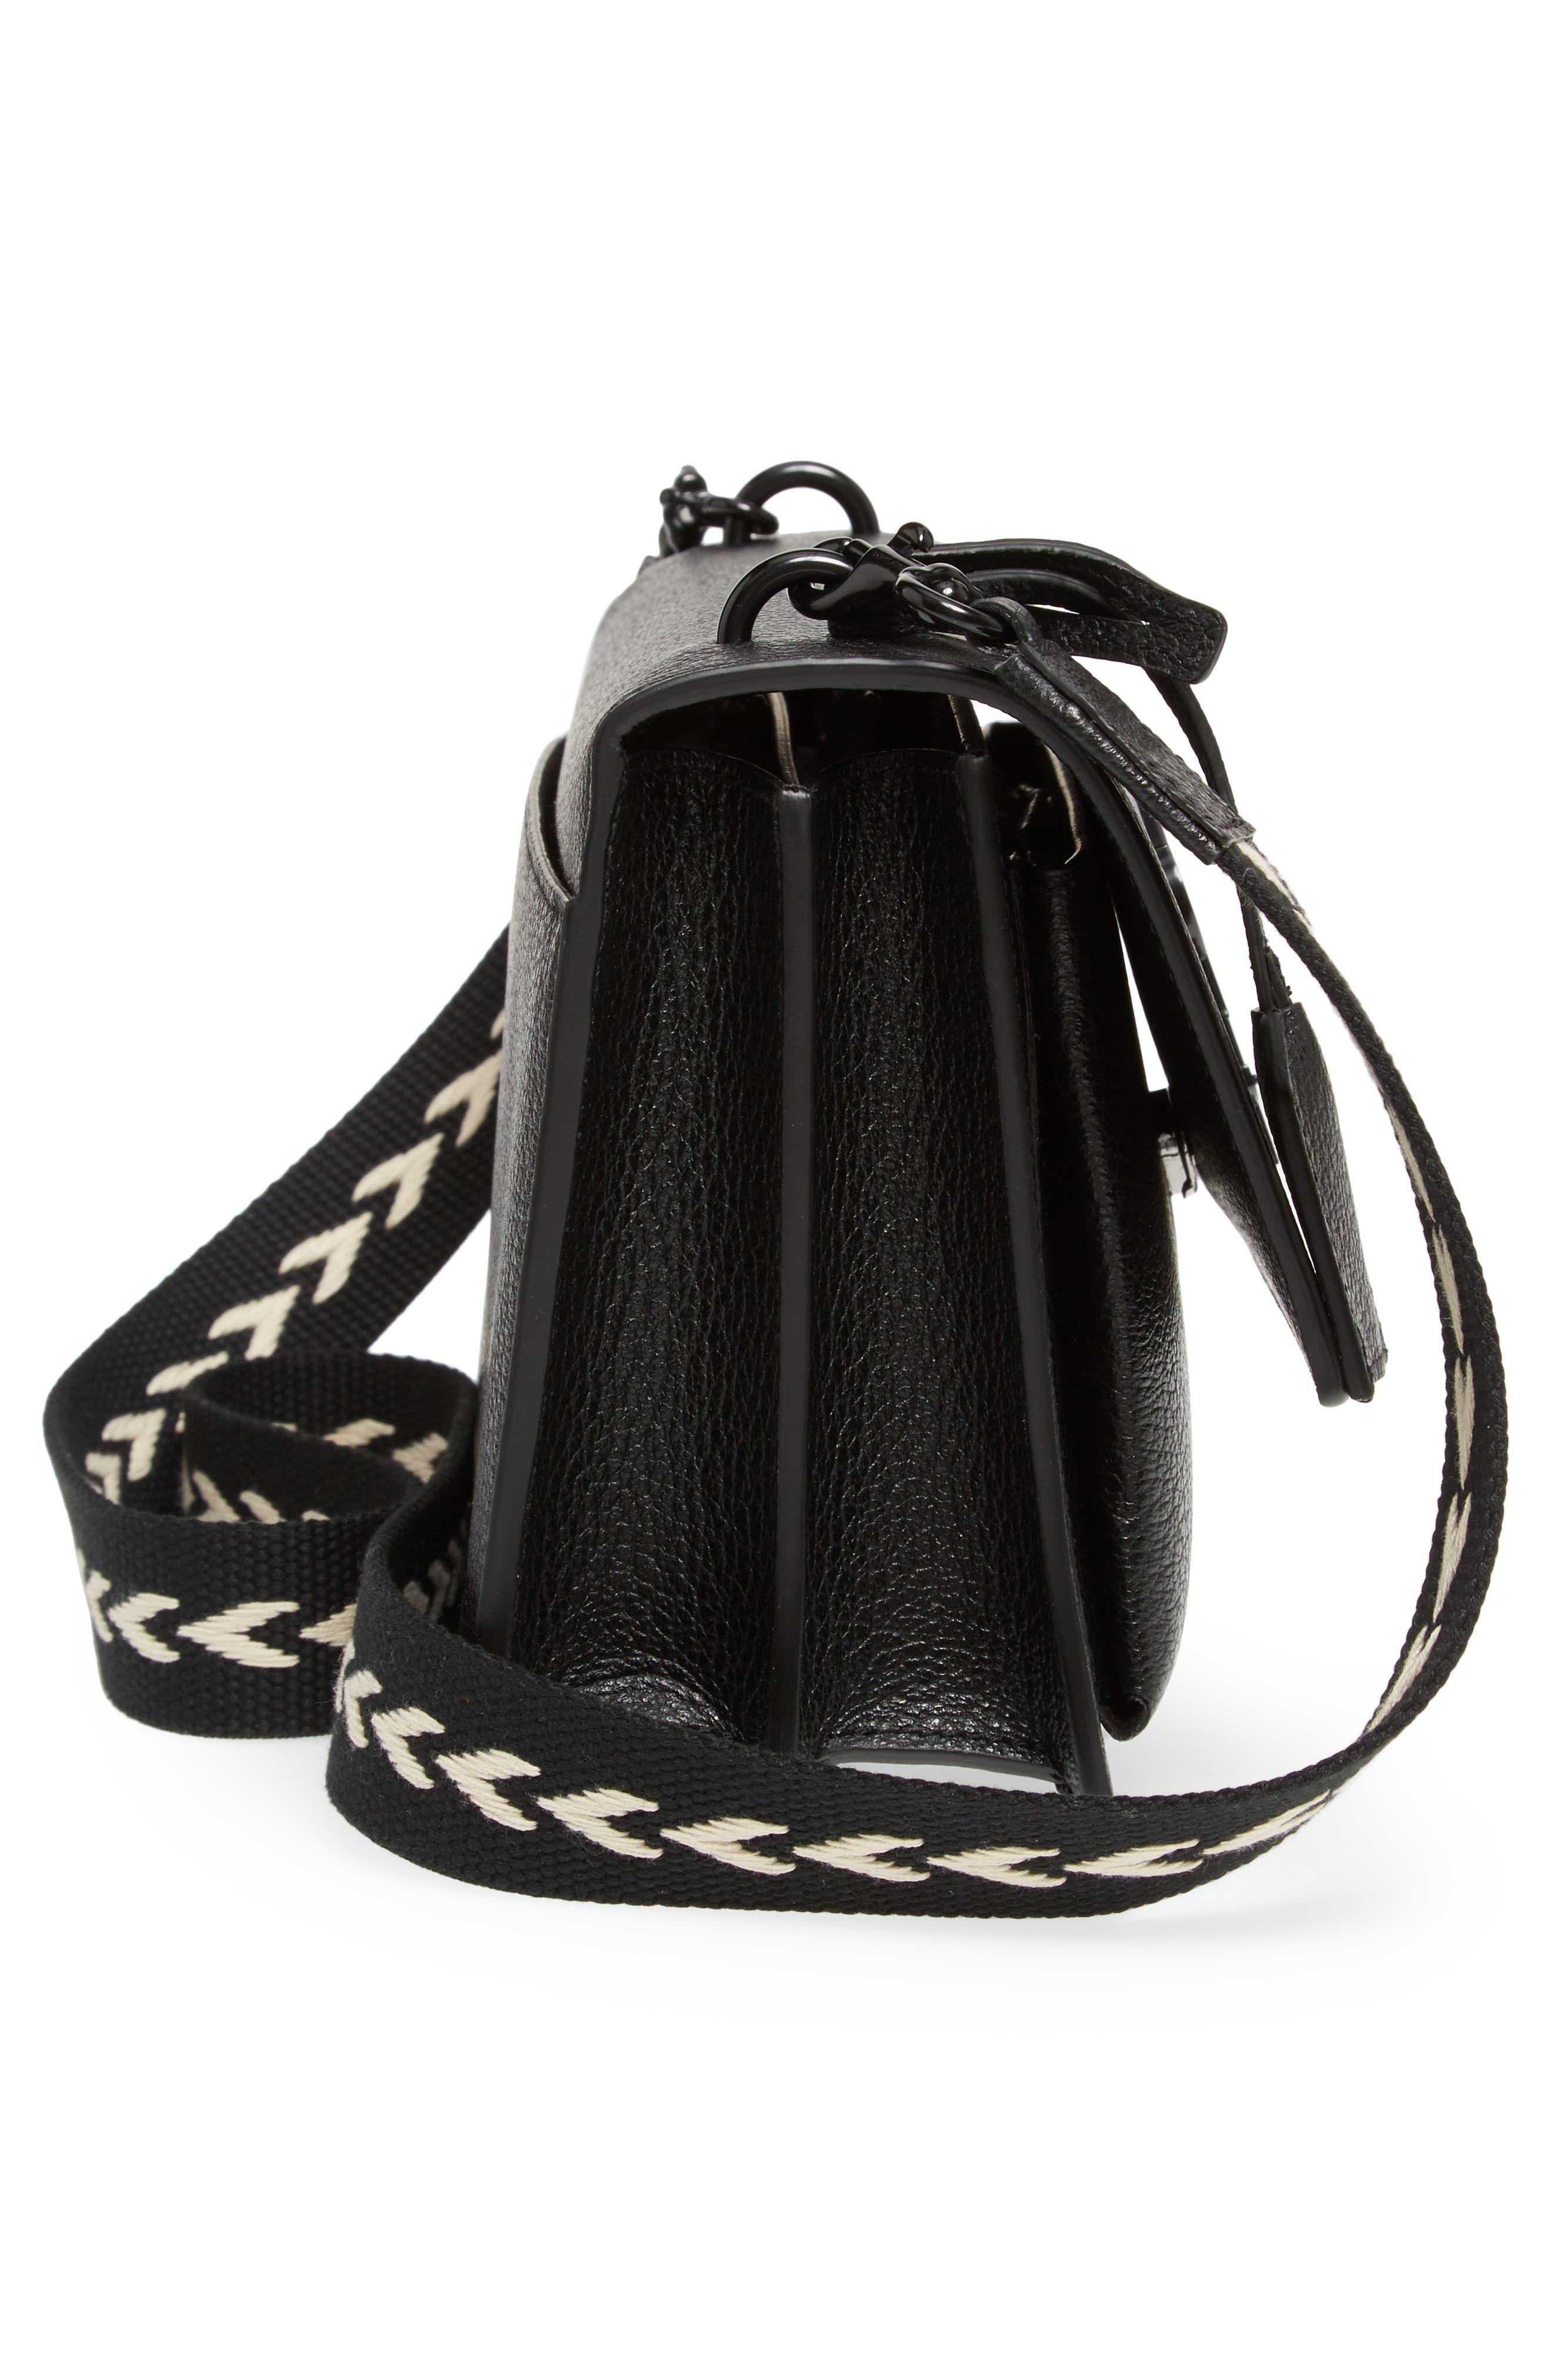 Medium Sunset Calfskin Shoulder Bag with Woven Guitar Strap,                             Alternate thumbnail 5, color,                             001